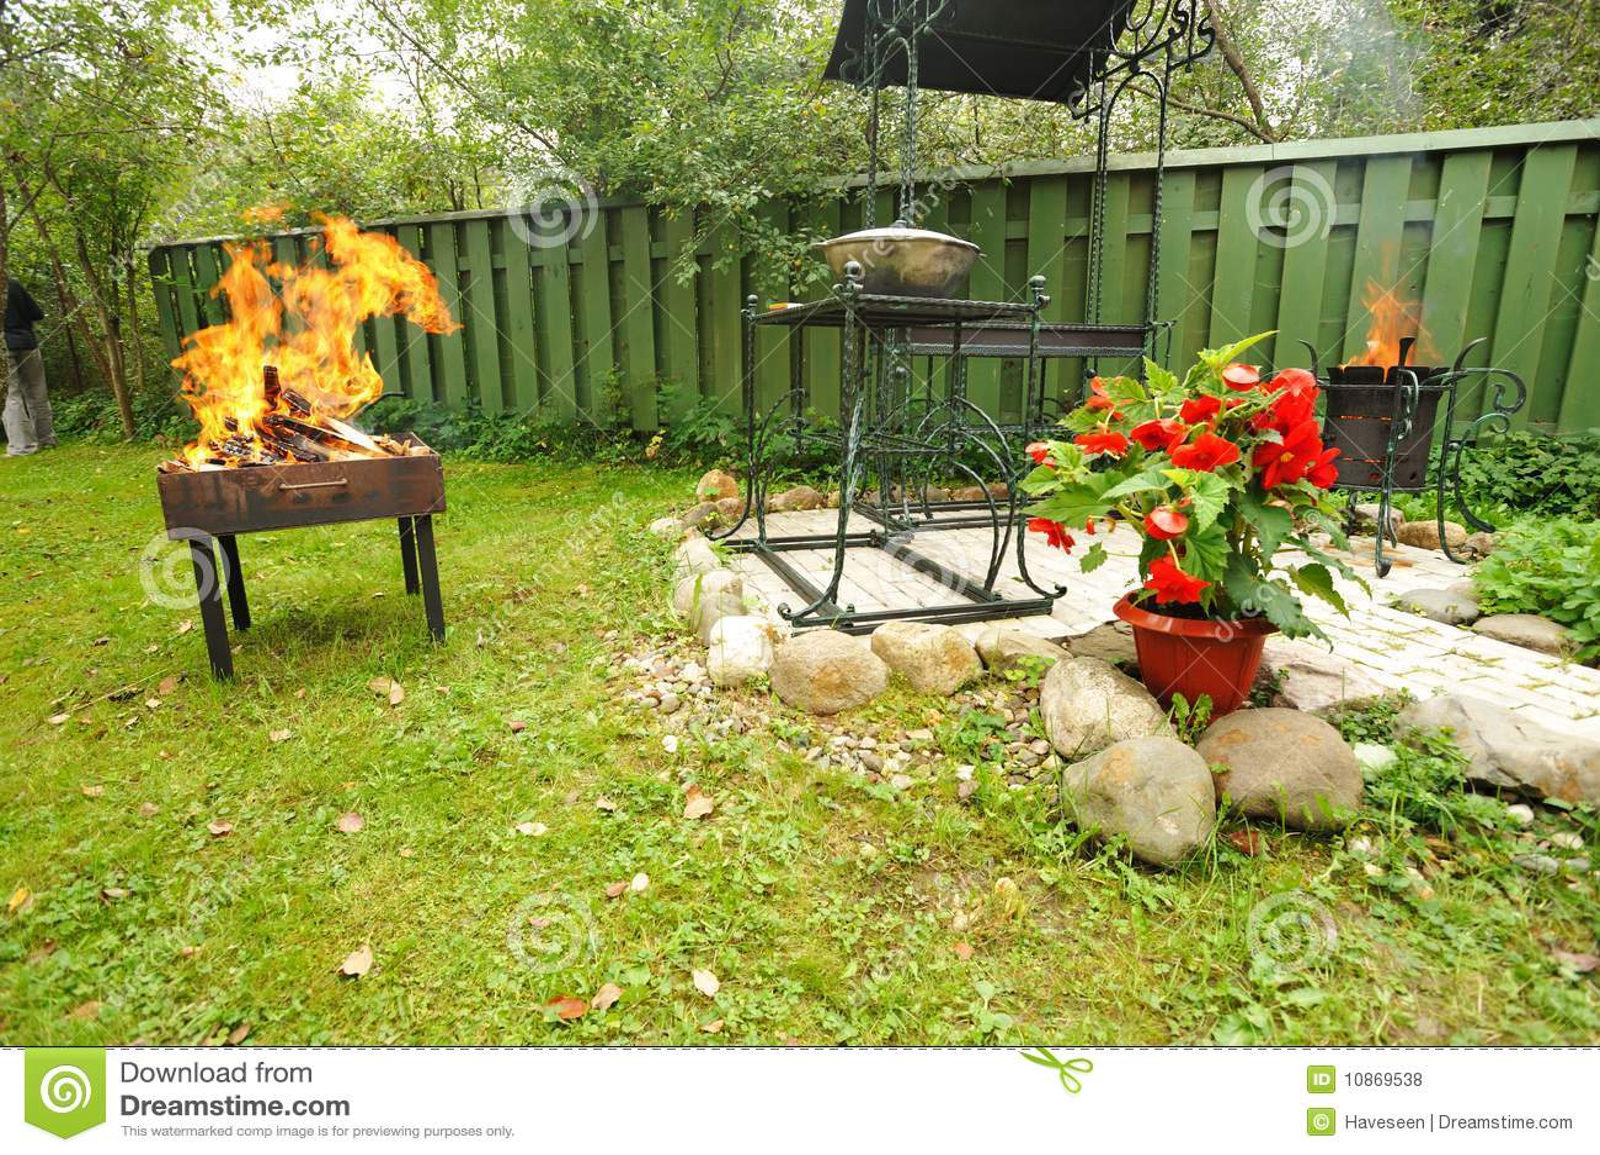 Backyard BBQ stock photo. Image of party, meal, backyard